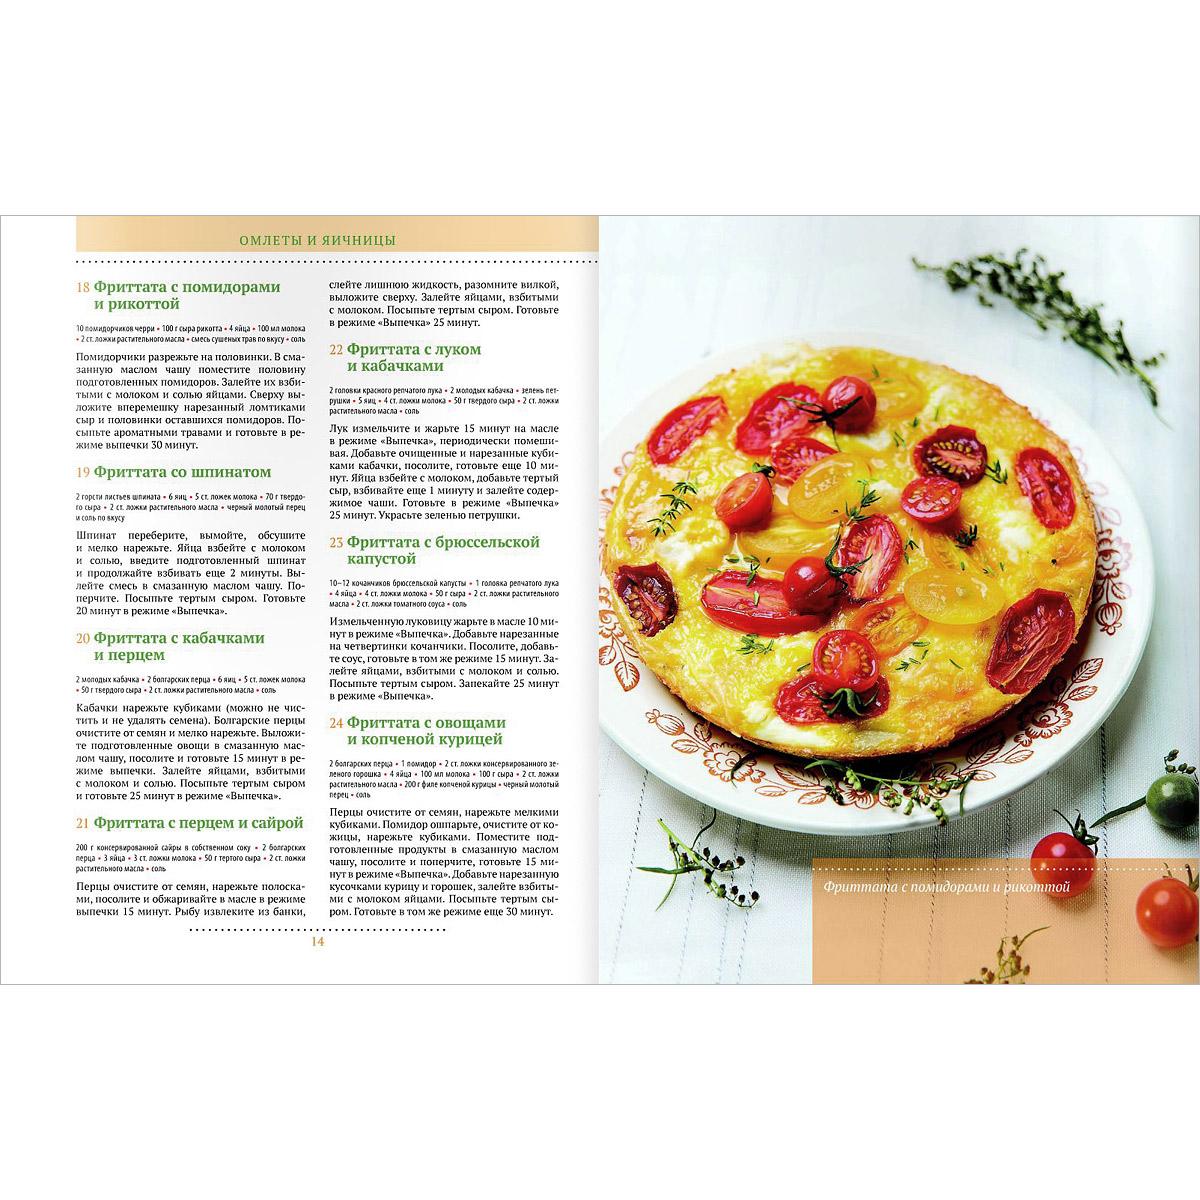 365 рецептов. Завтраки в мультиварке